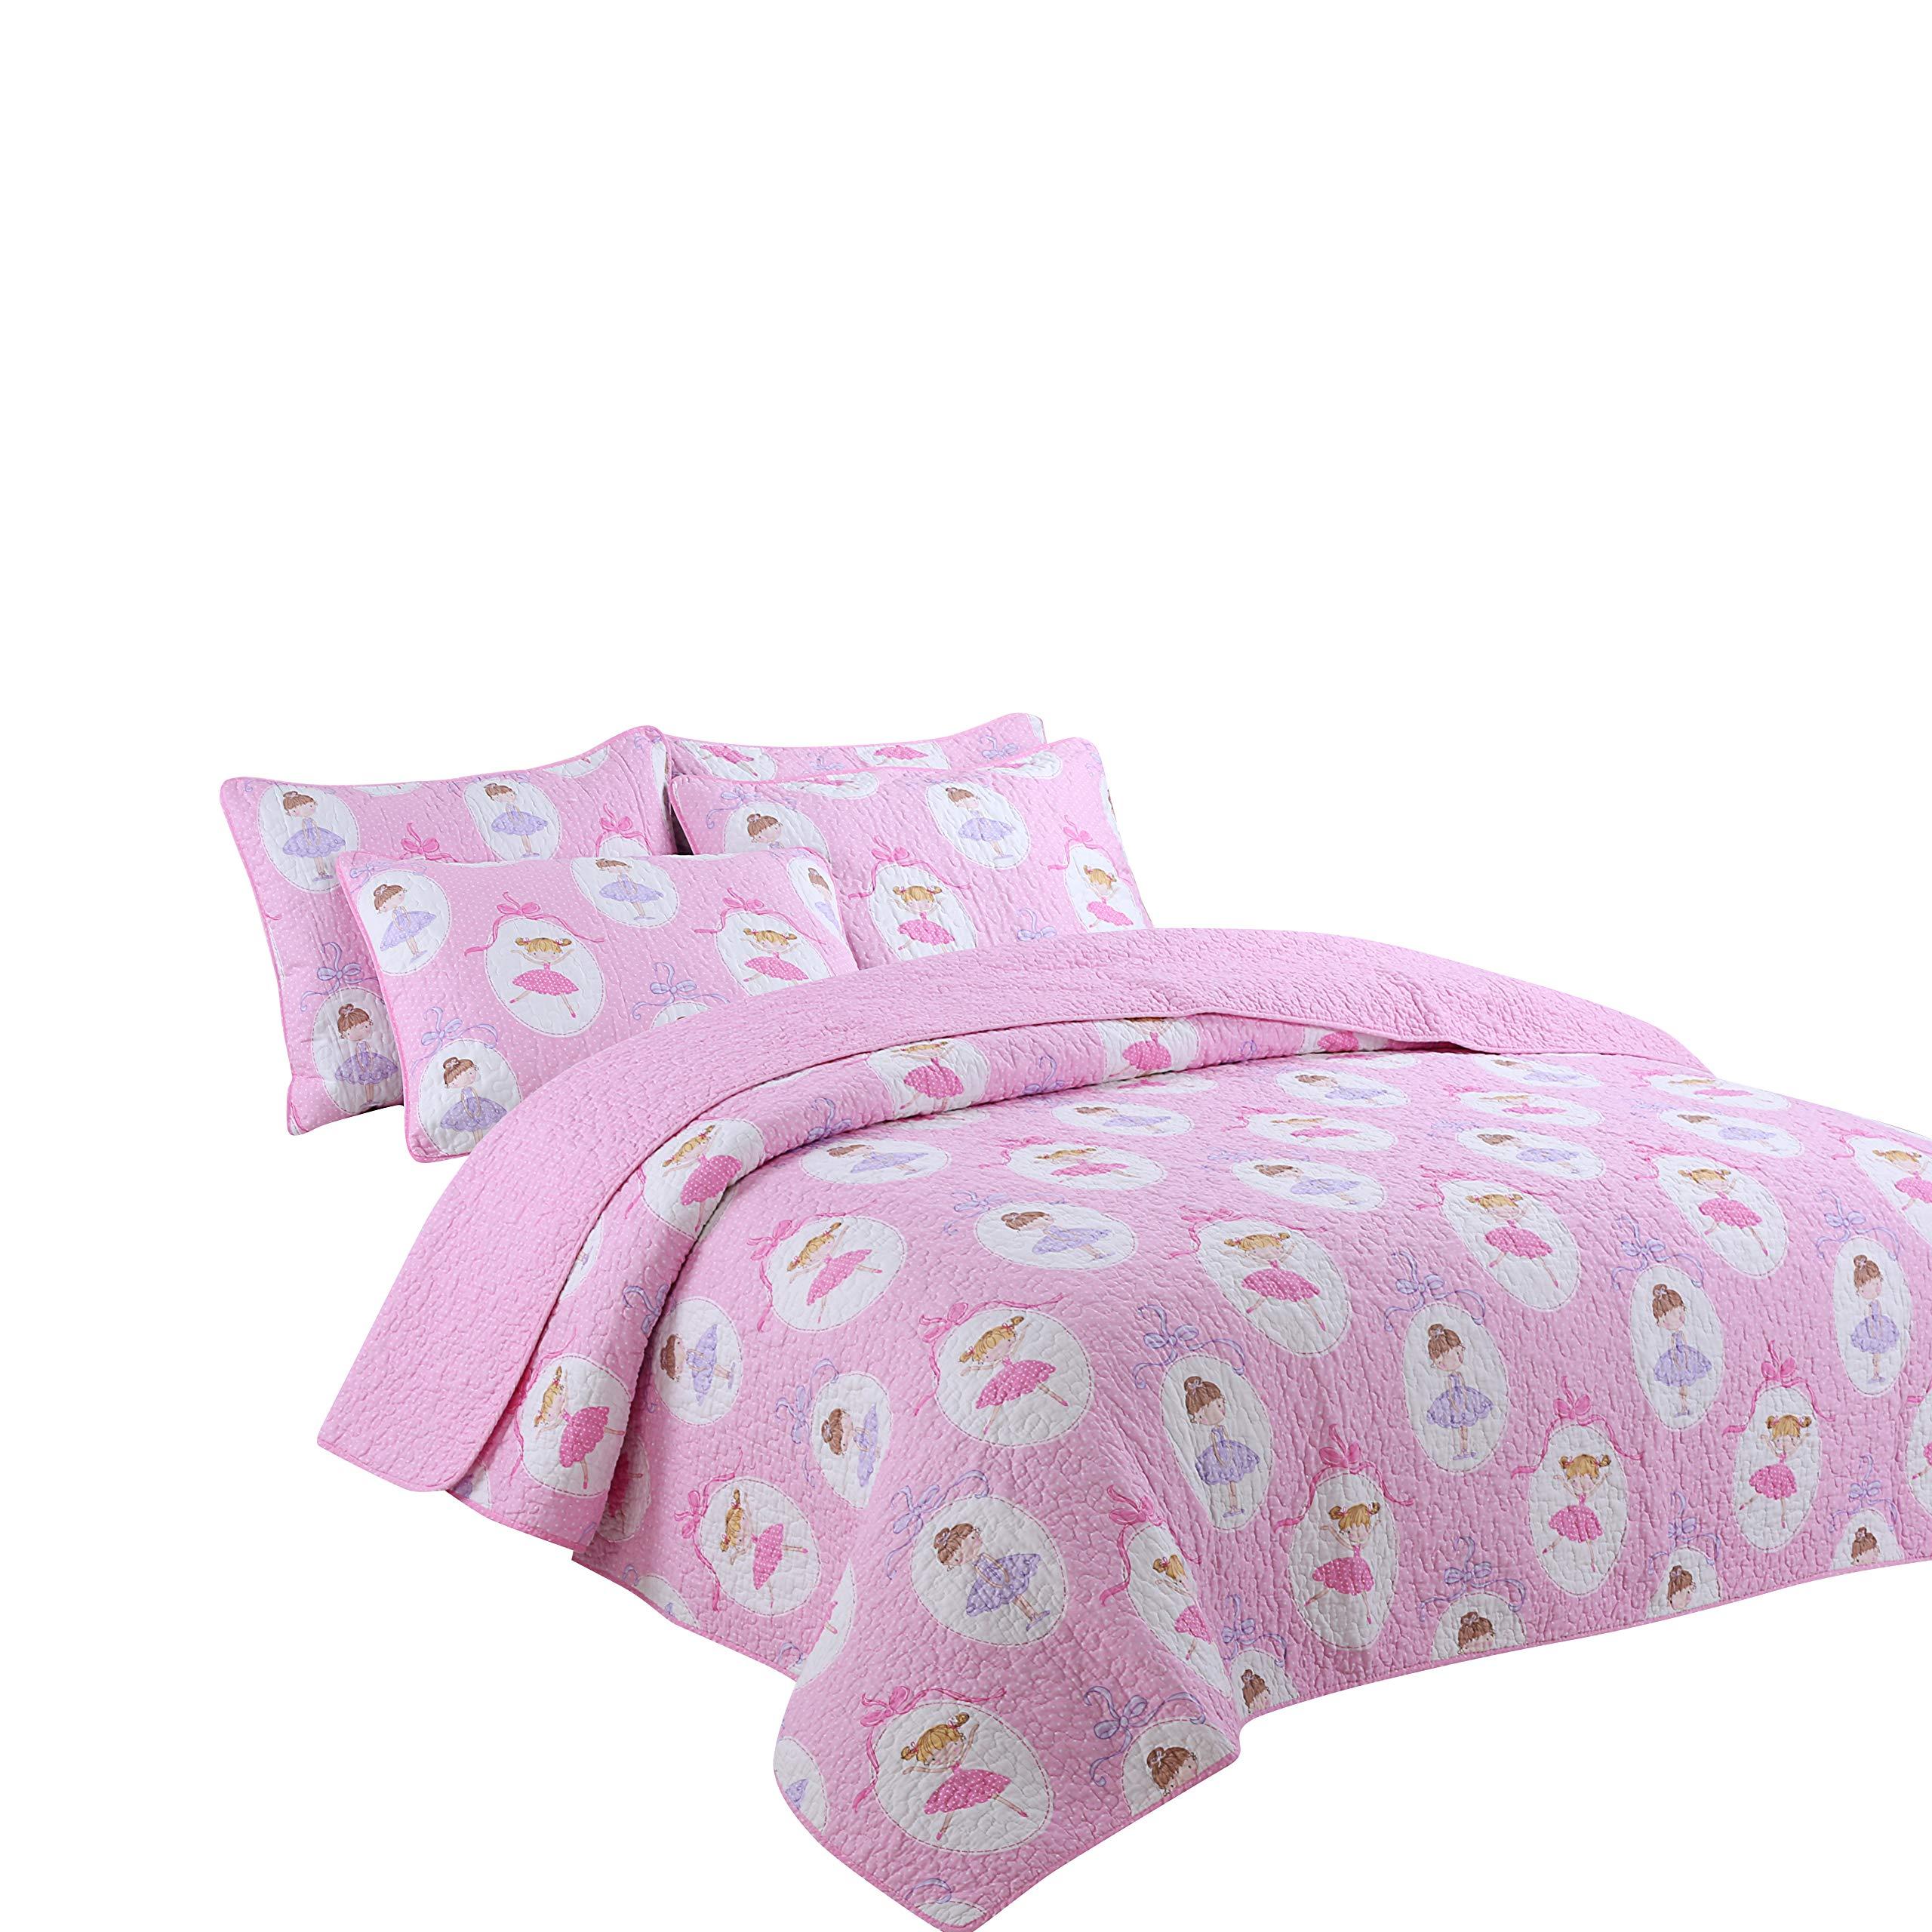 Lotus Karen Pink Dancing Girls Quilt Set - 100% Cotton Quilted Bedspread for Little Girls - 2PC Kids Quilt Bedding Set - Reversible Pink Polka Dot Coverlet Set Twin Size